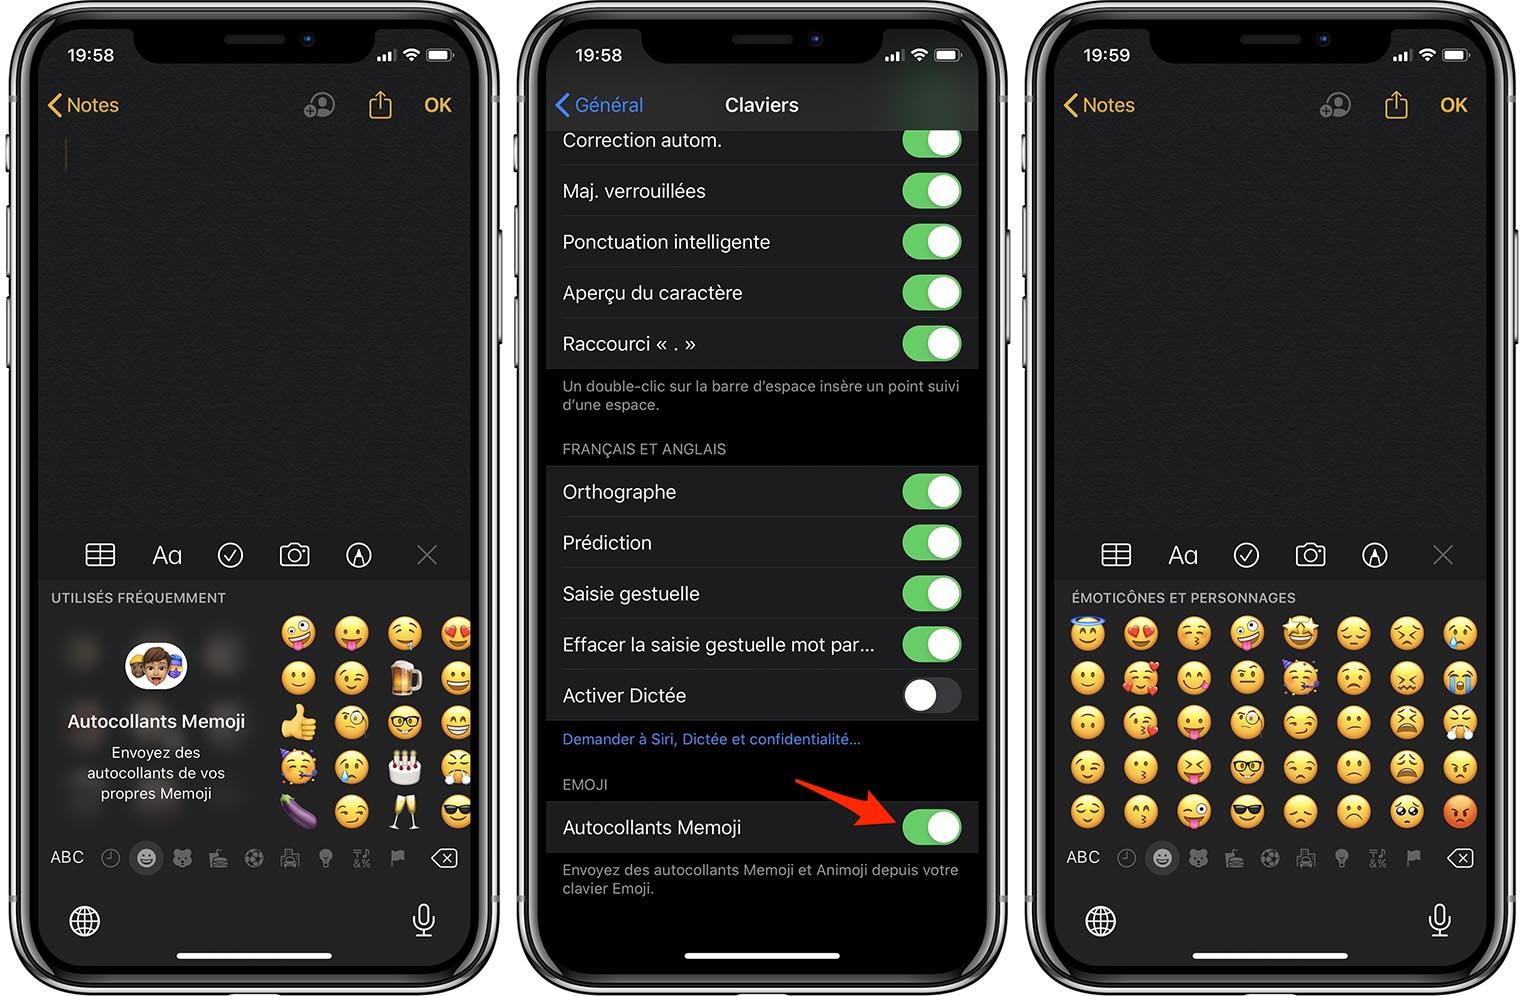 iOS 13.3 Autocollants Memoji